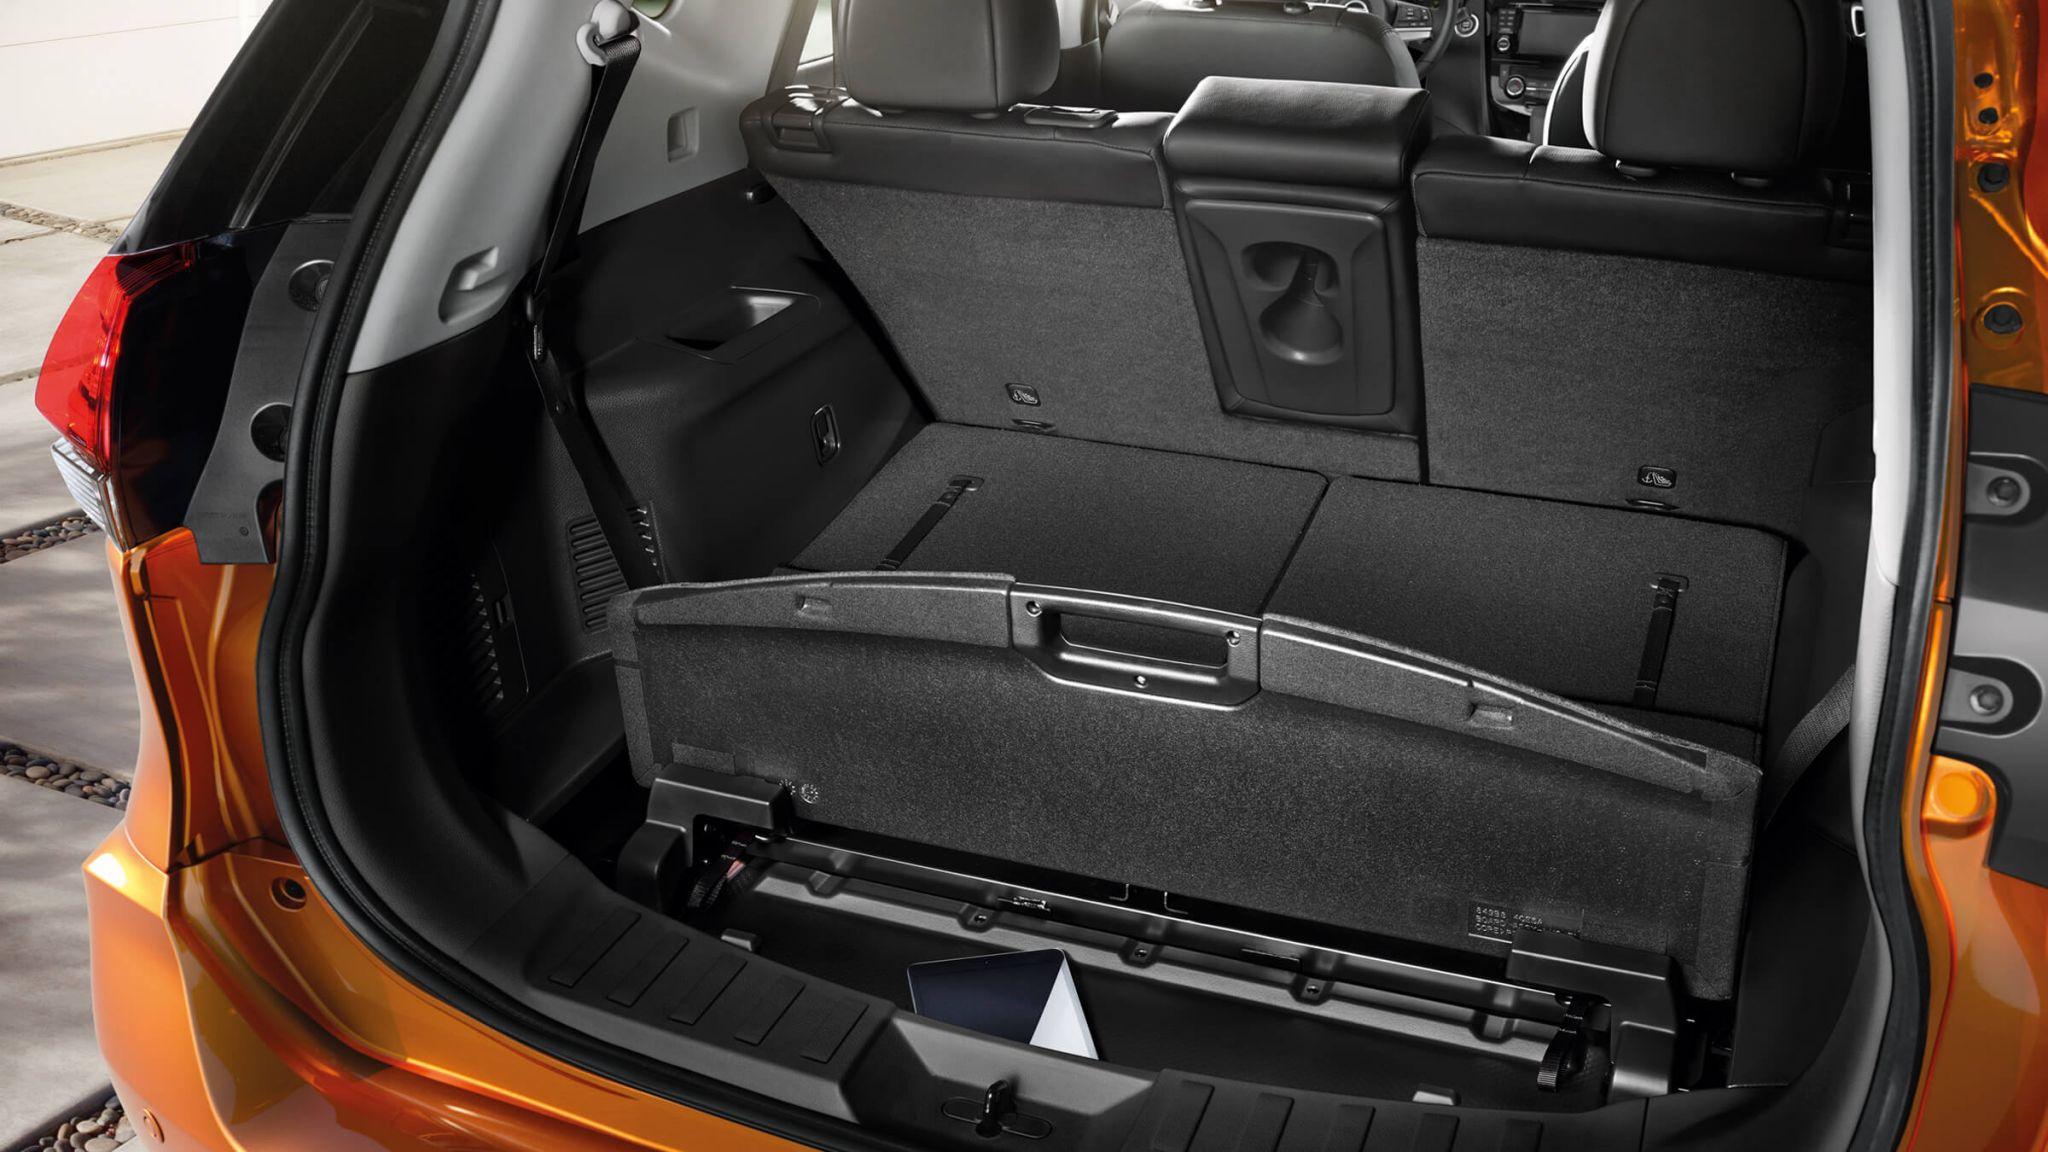 Nissan X-Trail Afmetingen - Bochane Groep